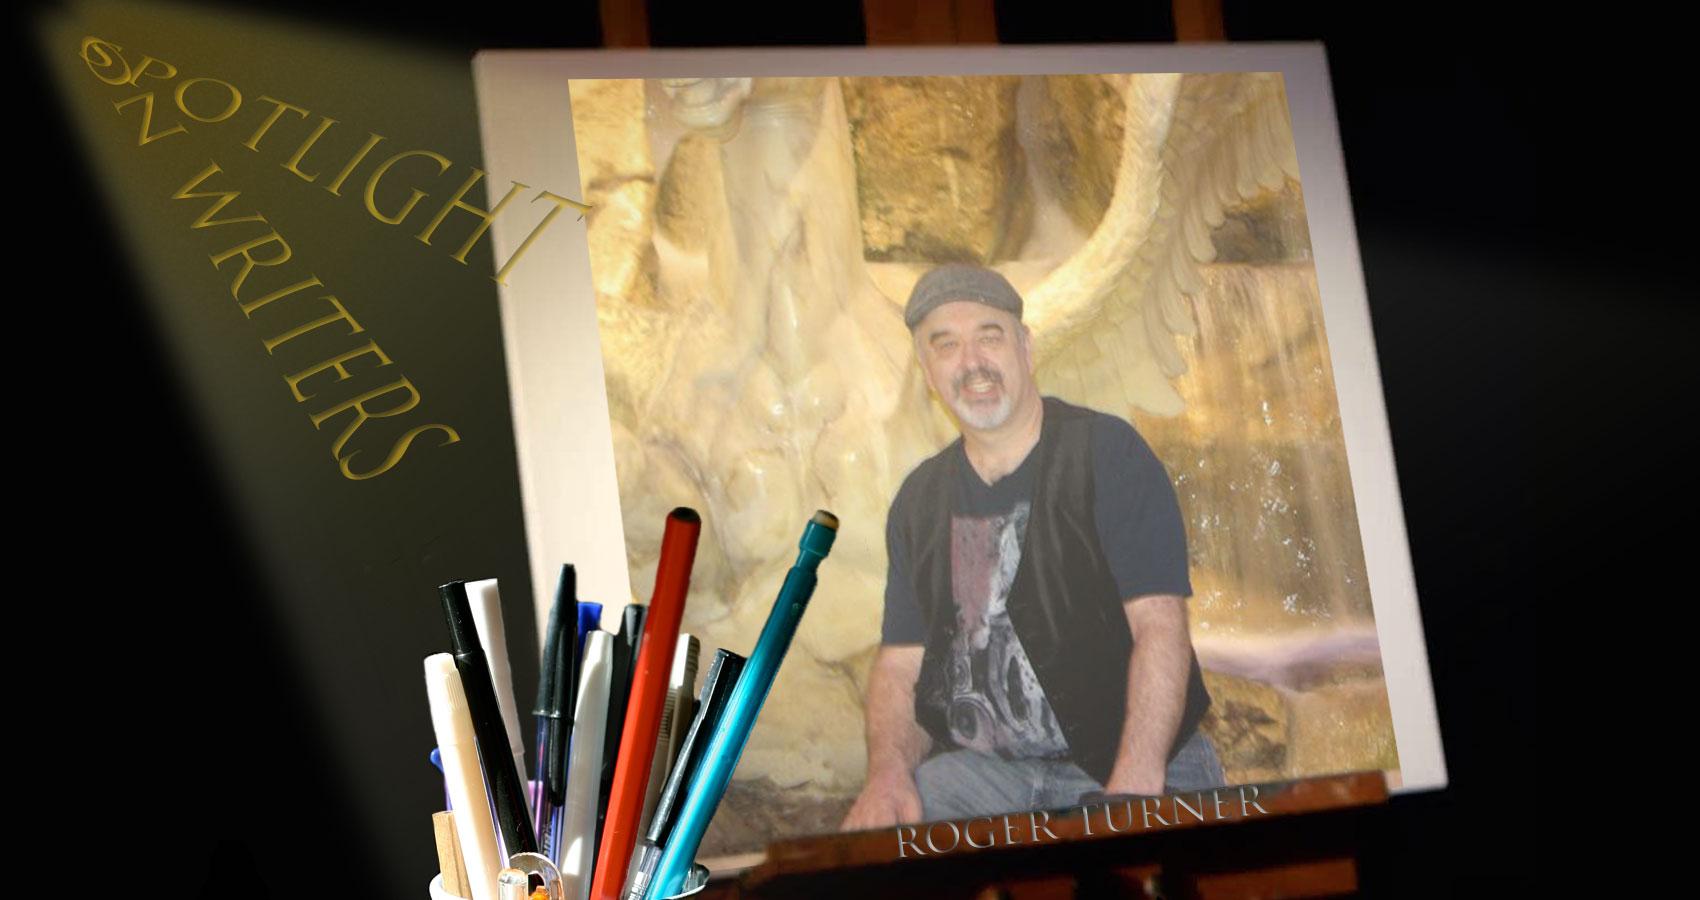 Spotlight On Writers - Roger Turner at Spillwords.com